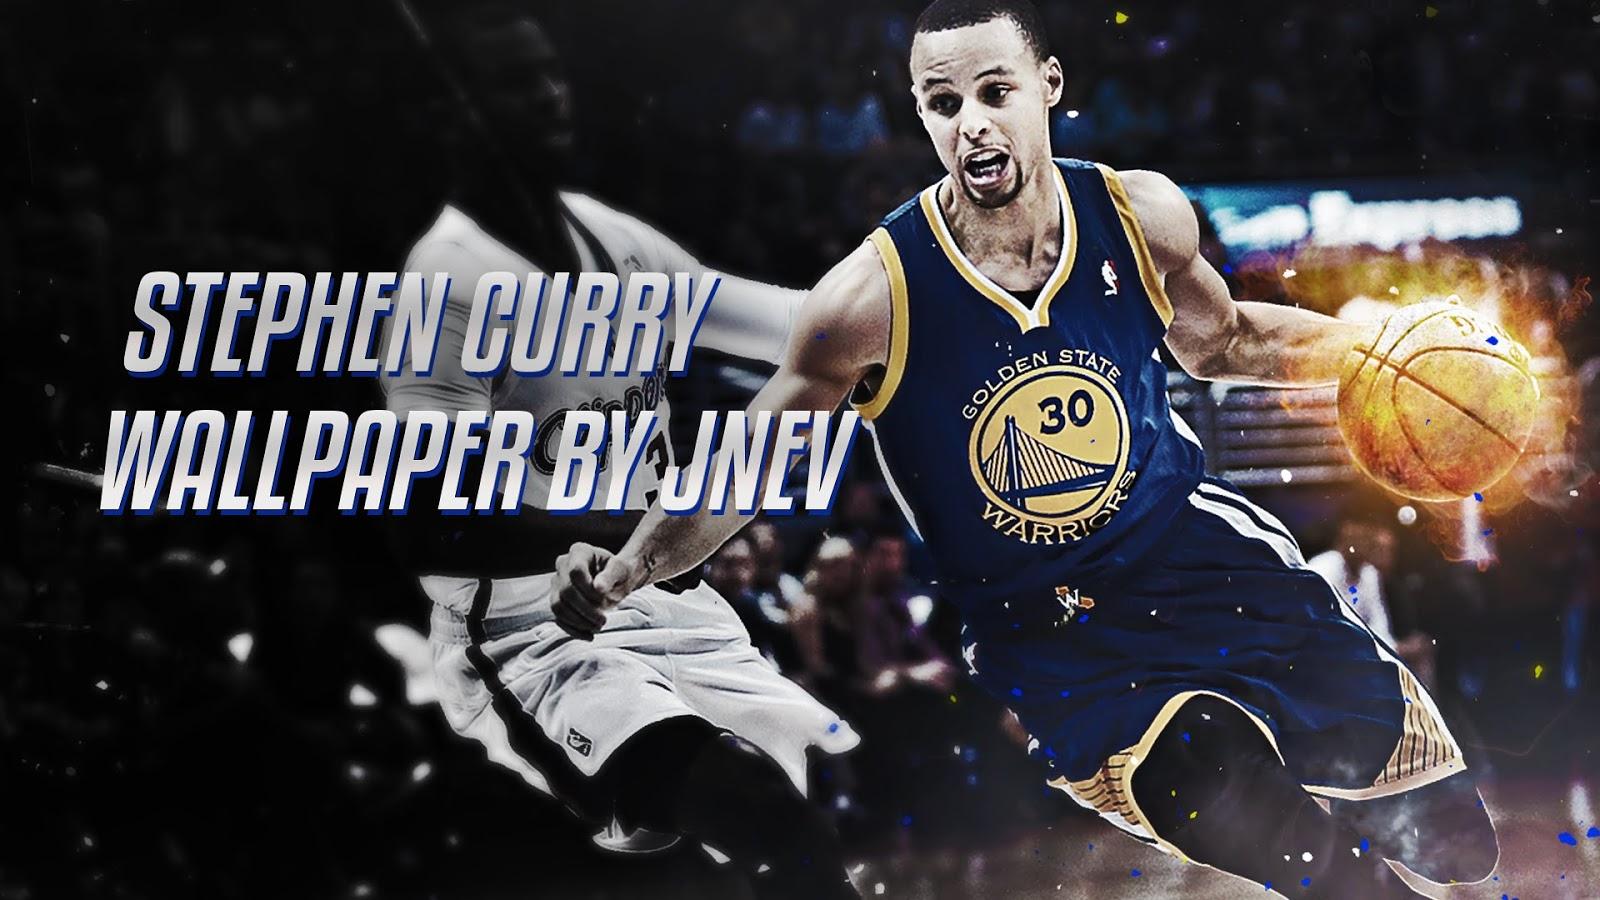 Sport Wallpaper Stephen Curry: Basketball Player Stephen Curry